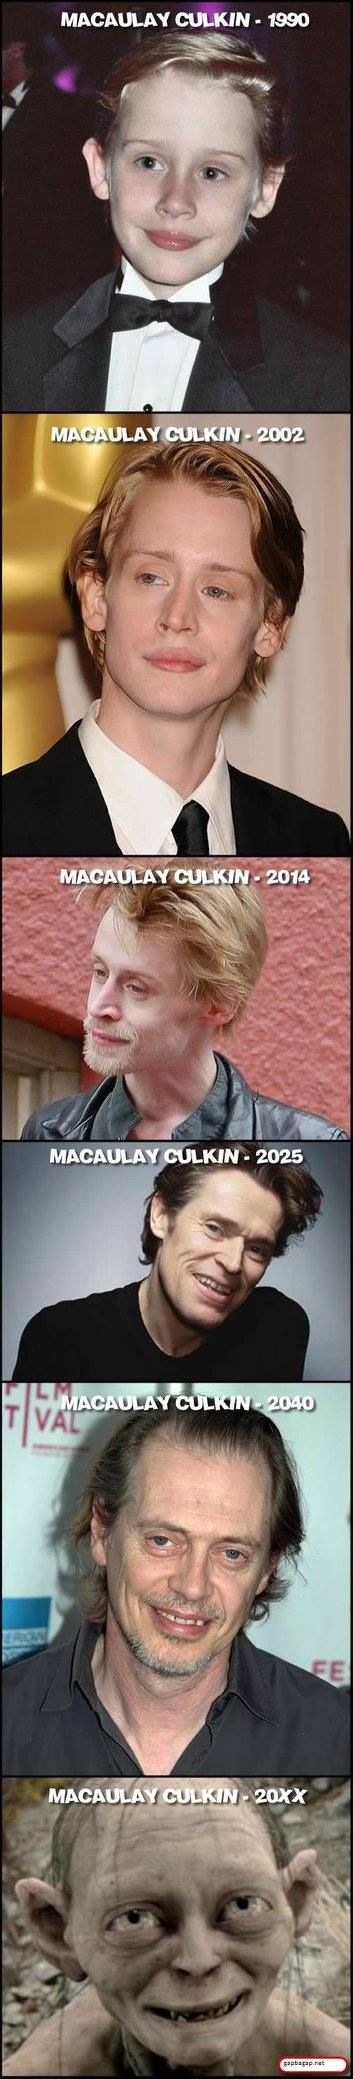 Funny Jokes About Macaulay Culkin